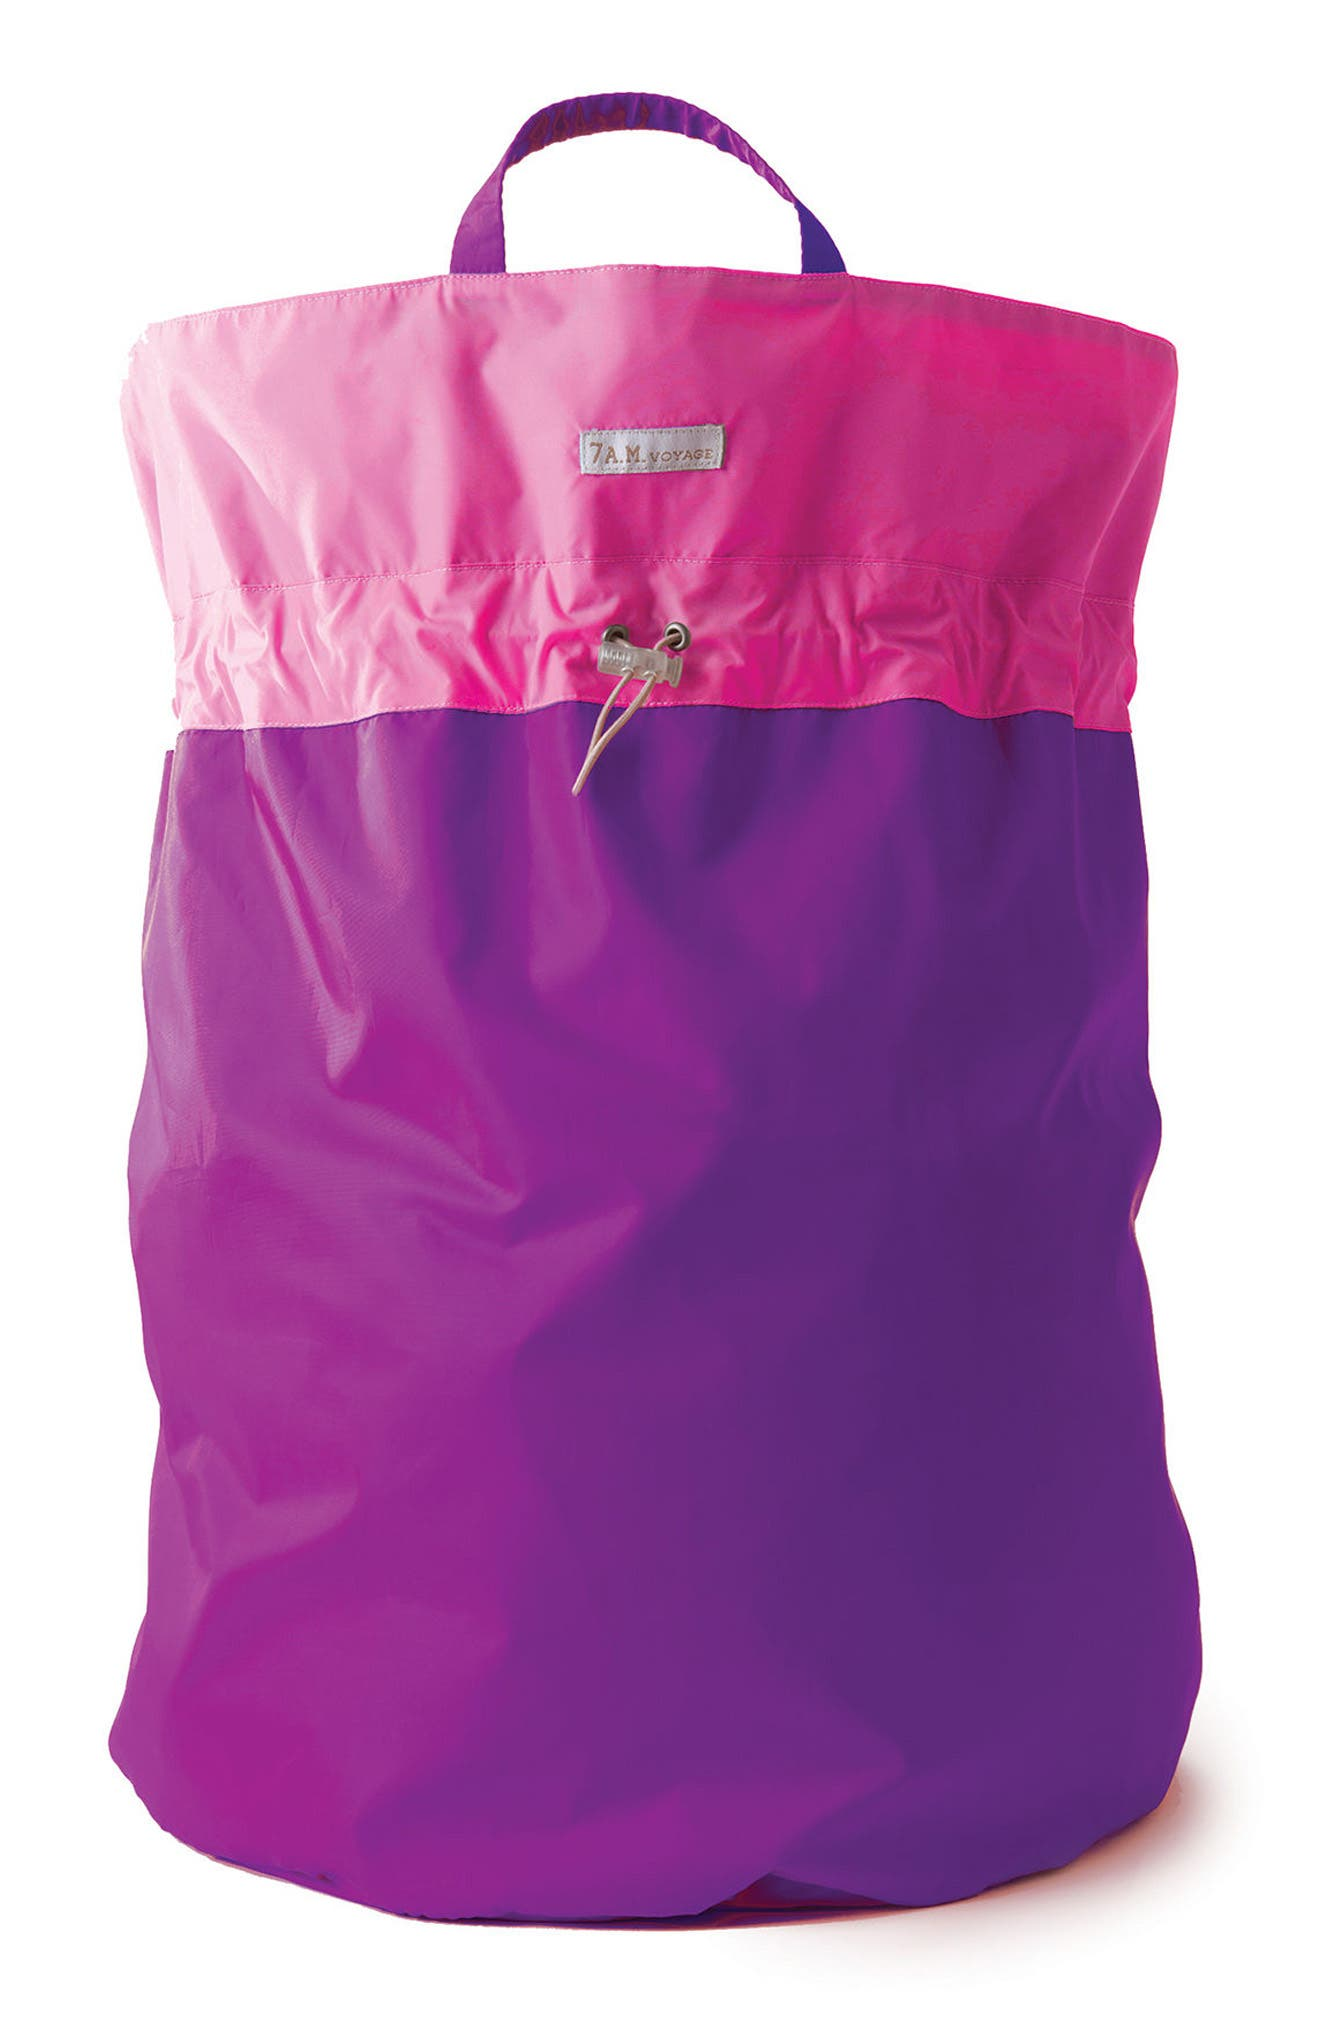 Main Image - 7 A.M. Enfant Water Repellent Hamper Bag